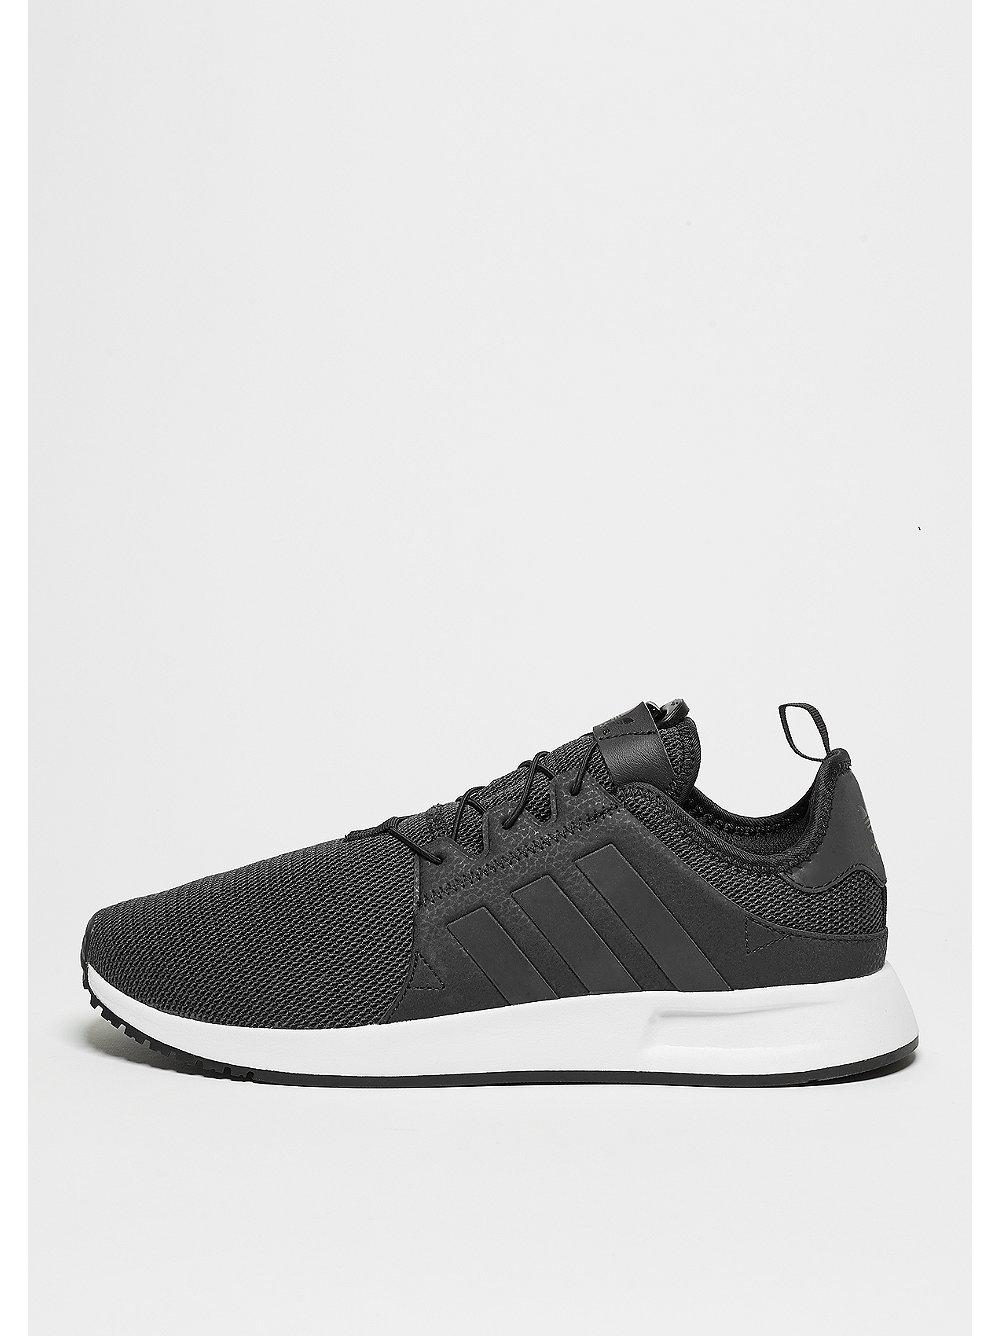 adidas X_PLR core black schwarz 42